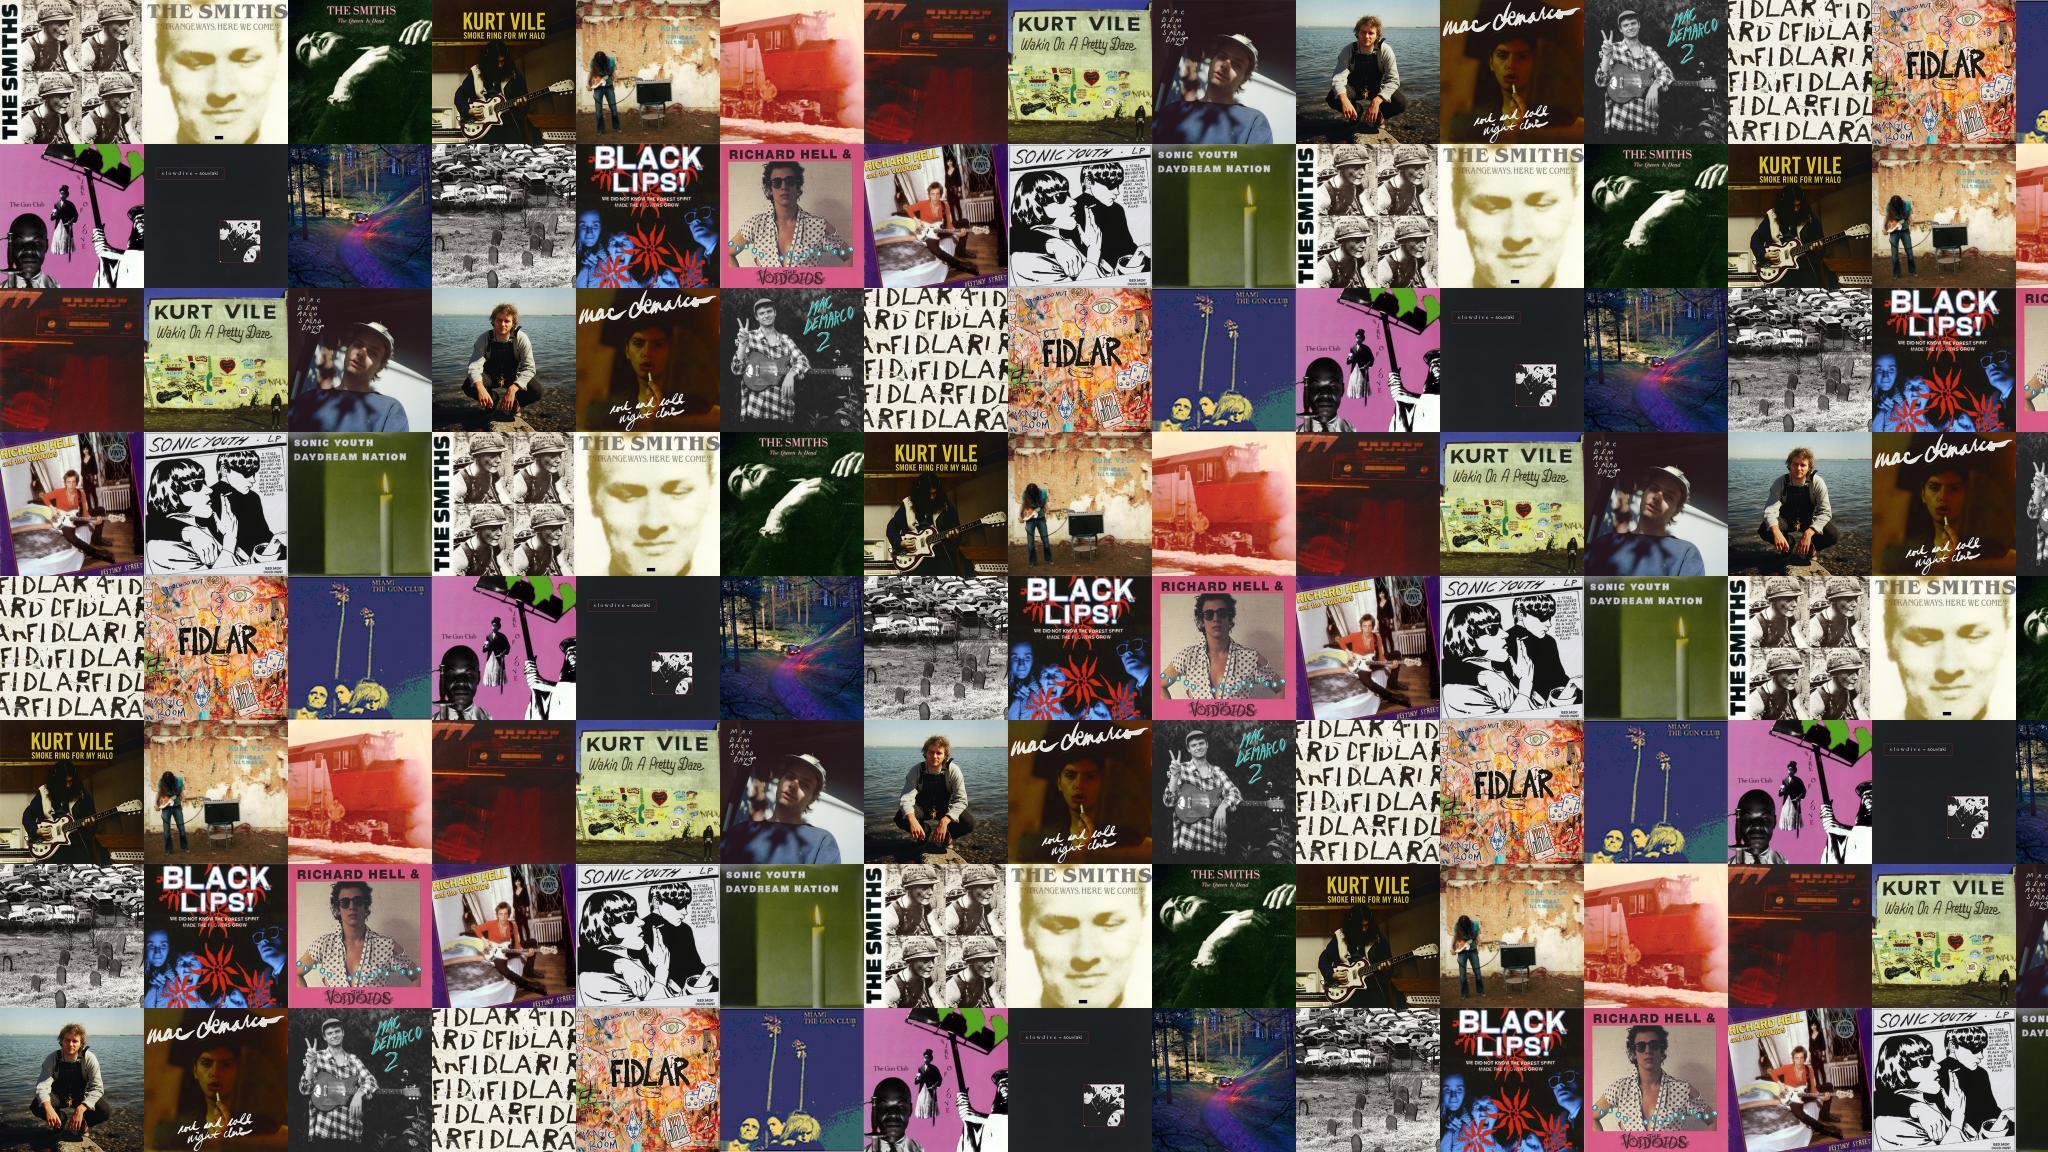 Gorillaz Iphone Wallpaper The Smiths Wallpapers 40 Wallpapers Adorable Wallpapers